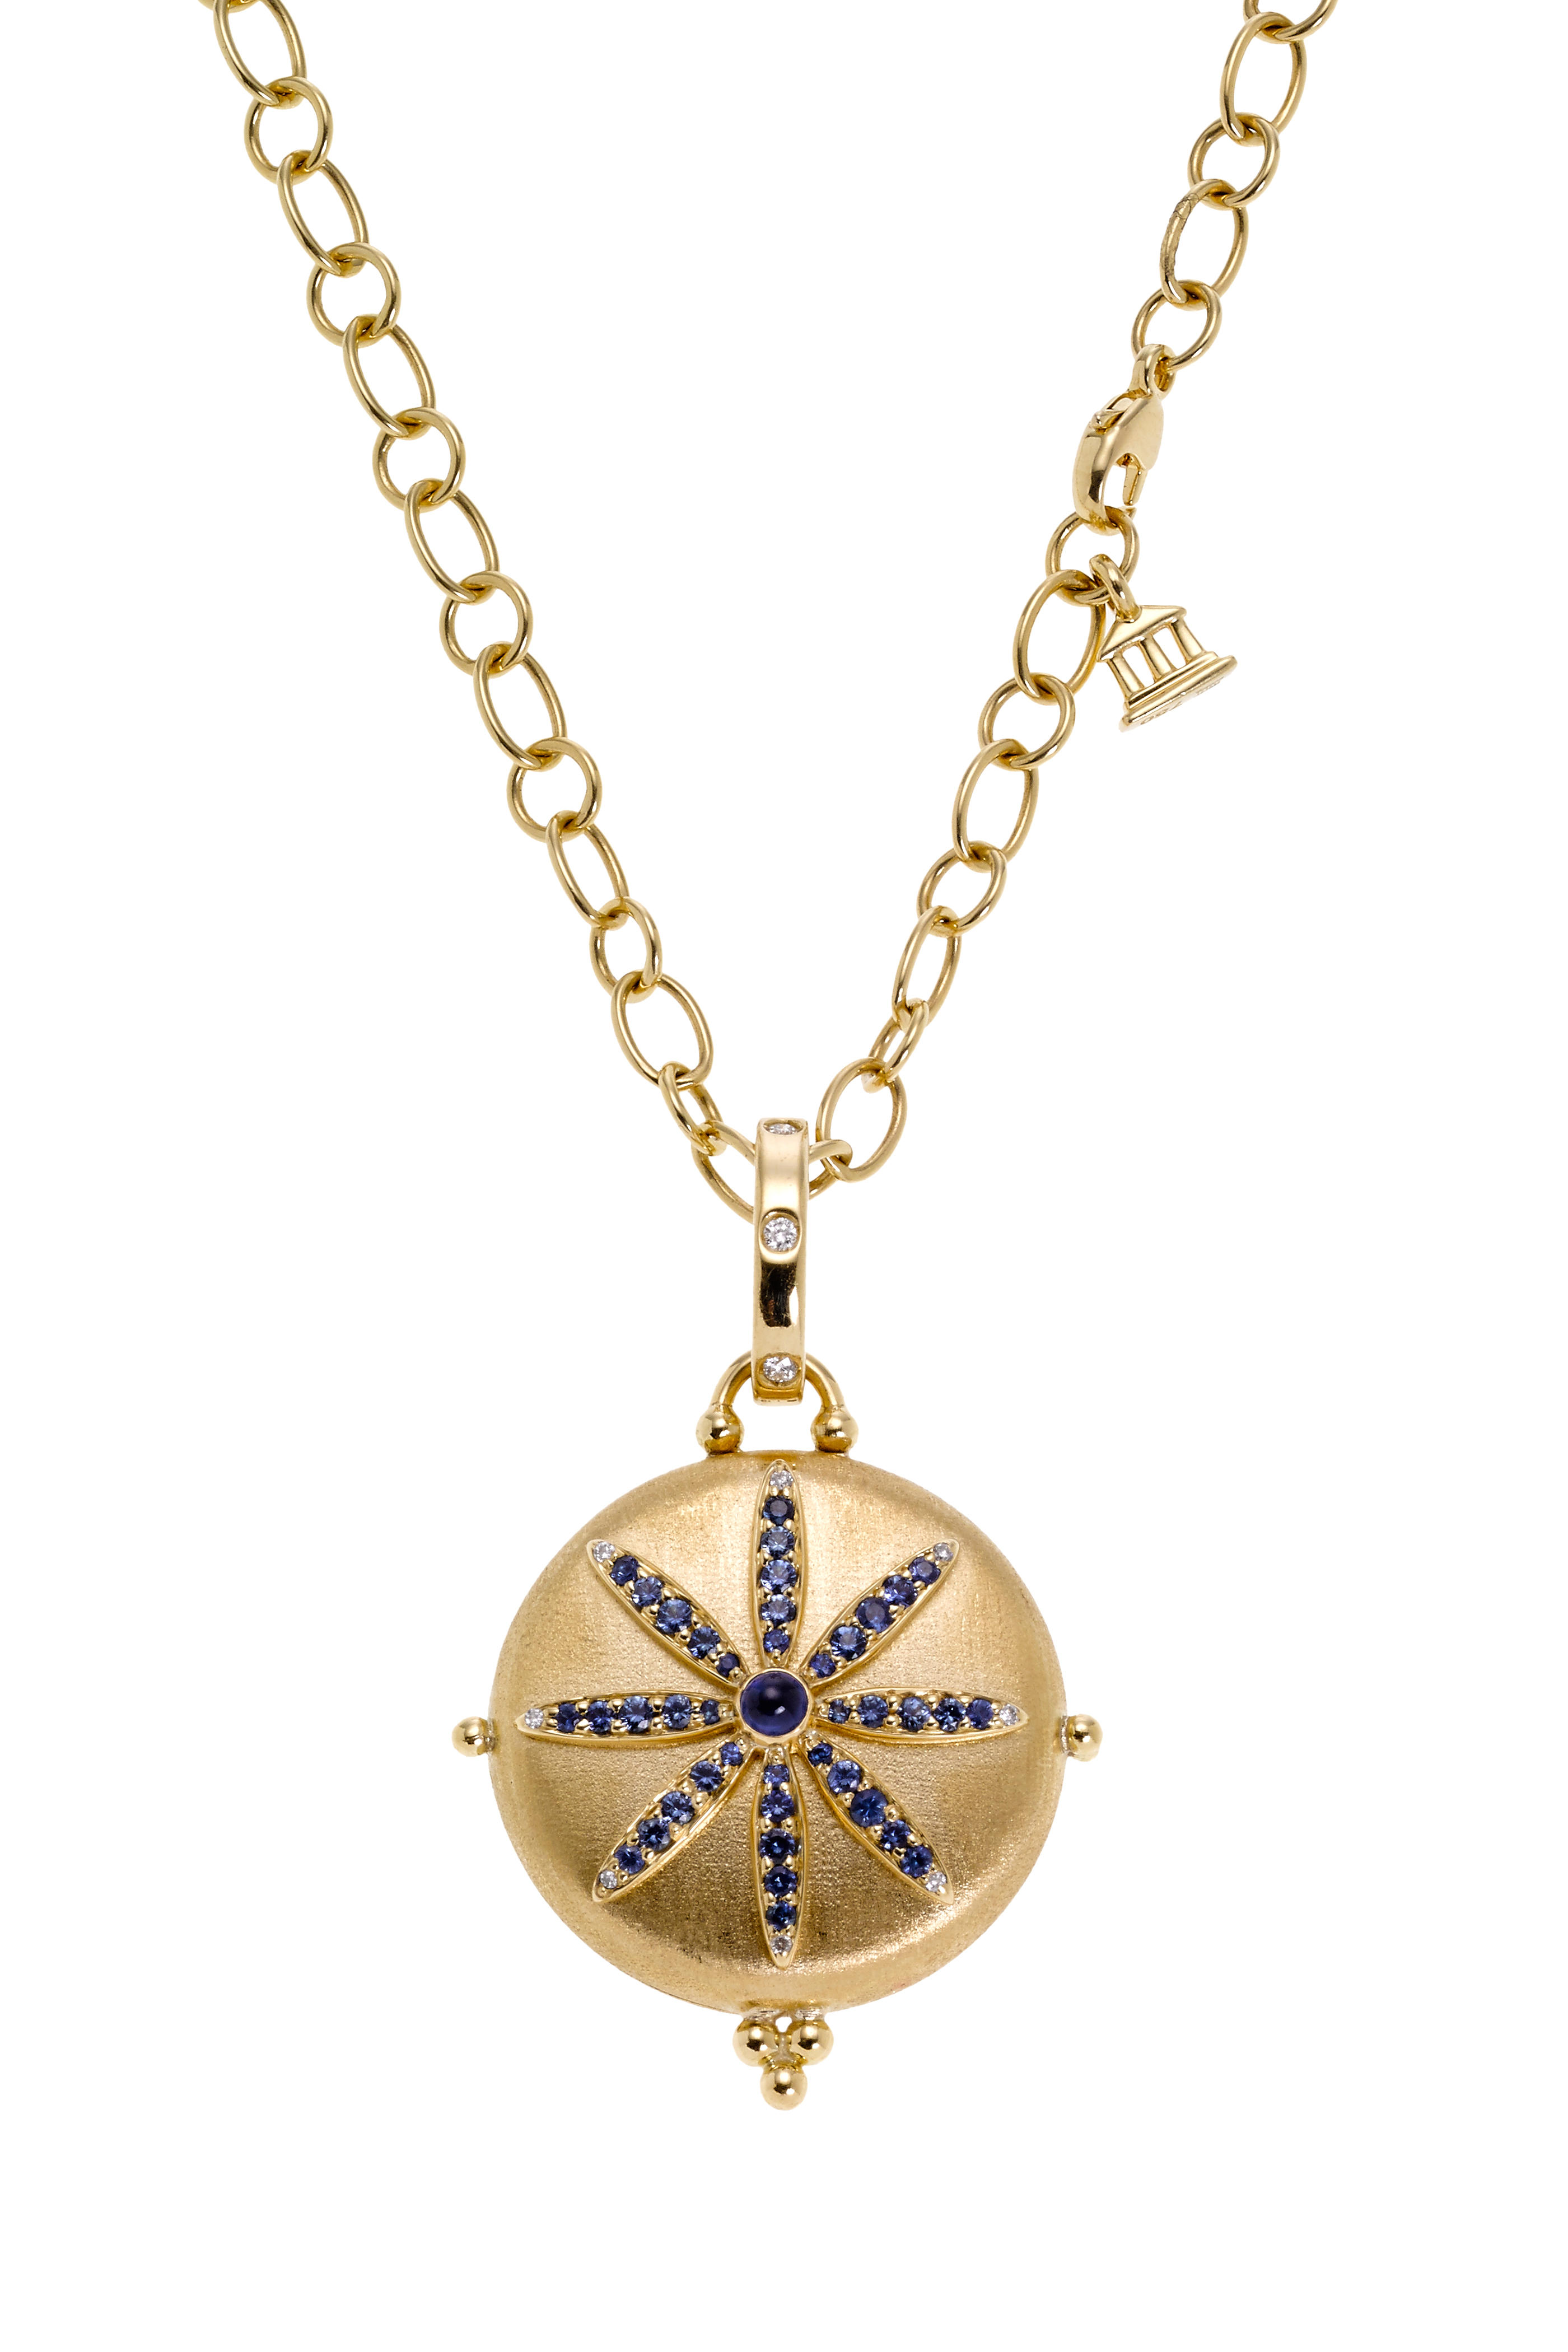 Temple St  Clair - 18K Gold Sapphire & Diamond Sorcerer